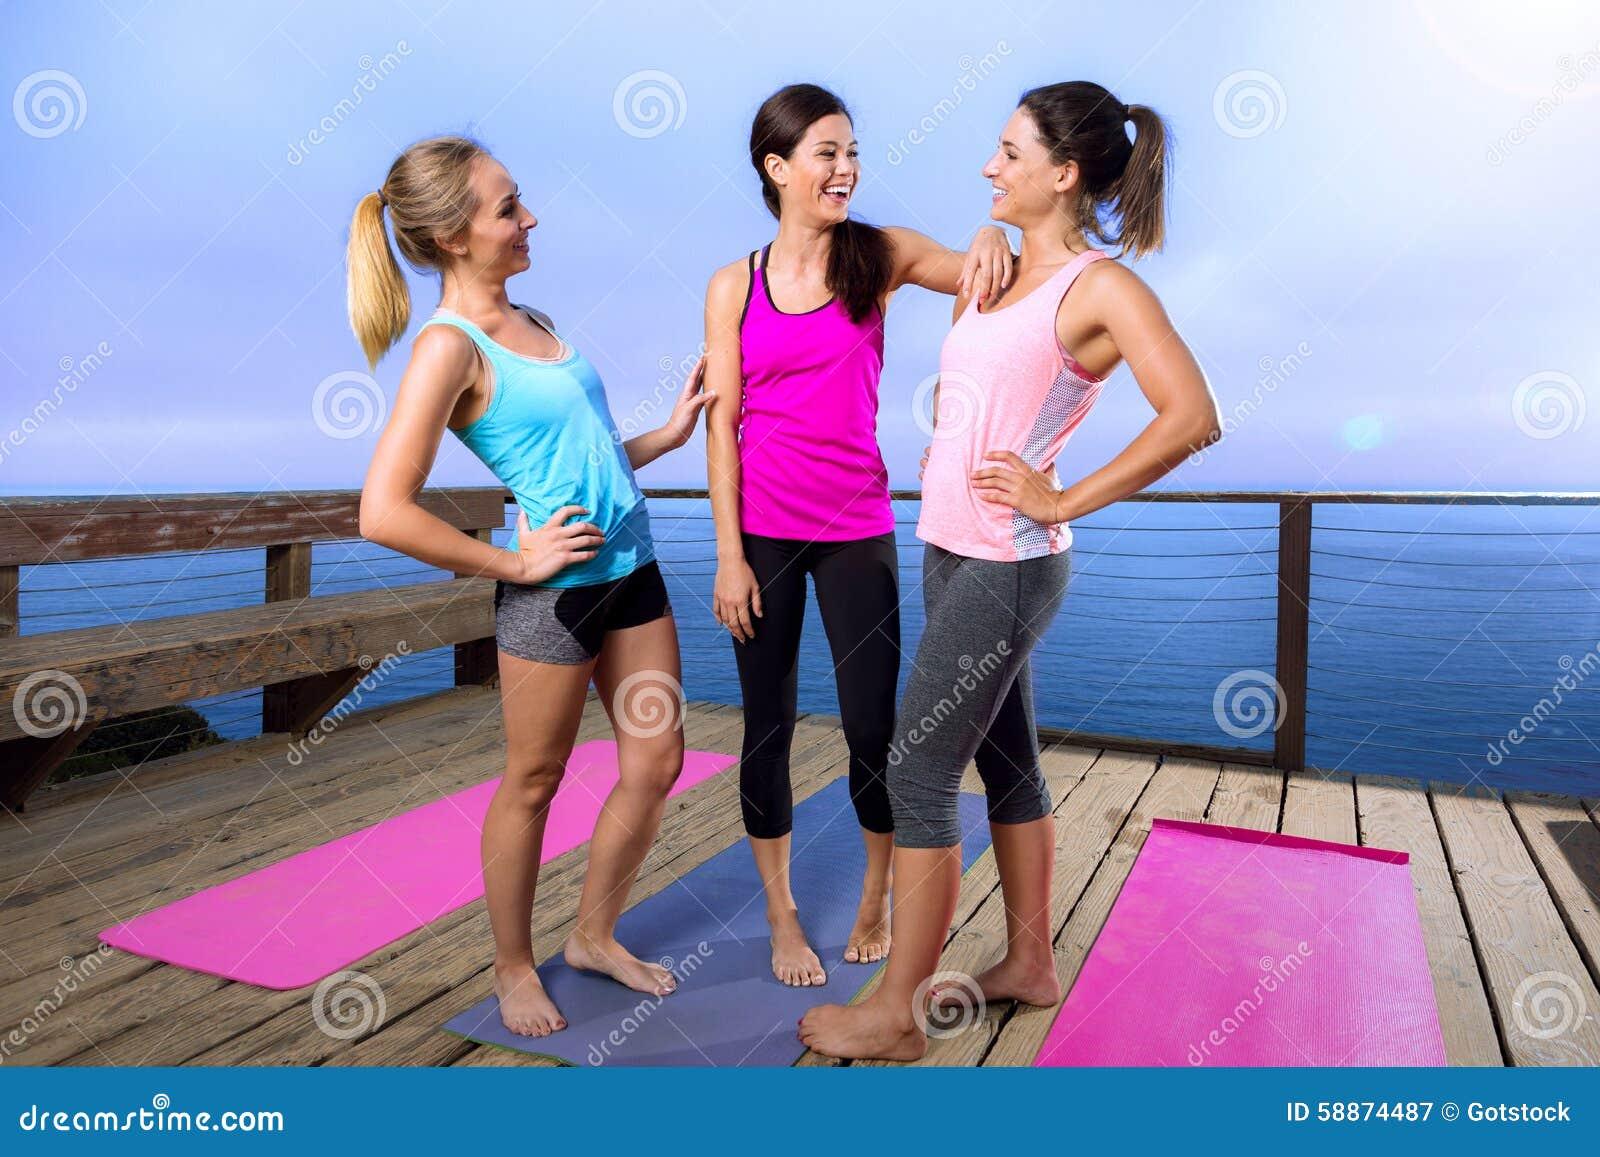 friends spiritual bond yoga classmates laugh casual conversation friendly before class stock. Black Bedroom Furniture Sets. Home Design Ideas